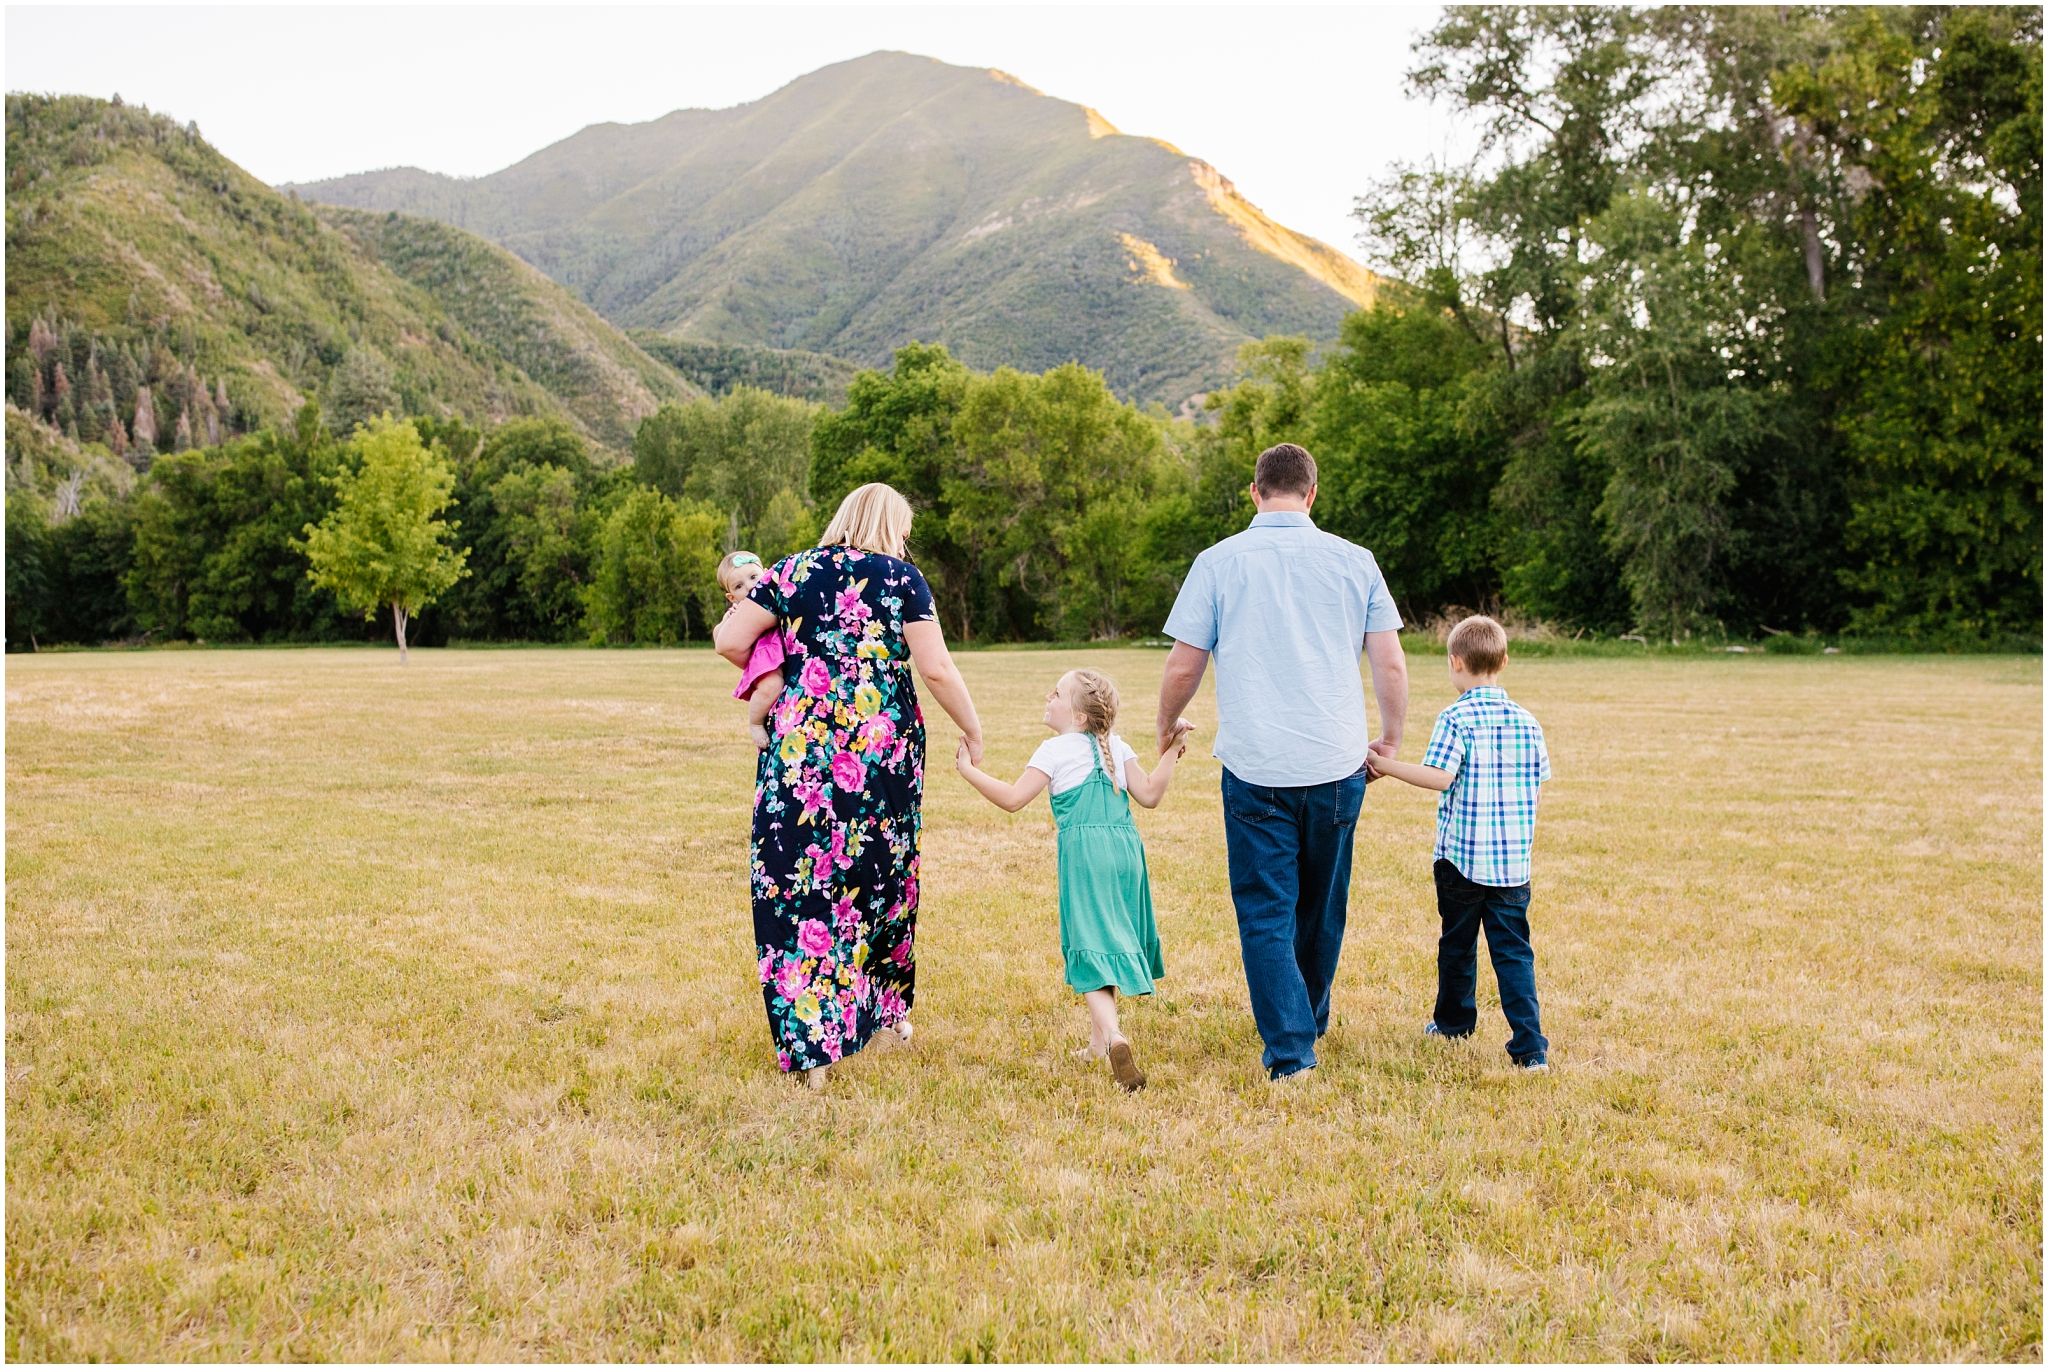 Lizzie-B-Imagery-Utah-Family-Photographer-Utah-County-Photographer-Hobble-Creek-Canyon_0031.jpg